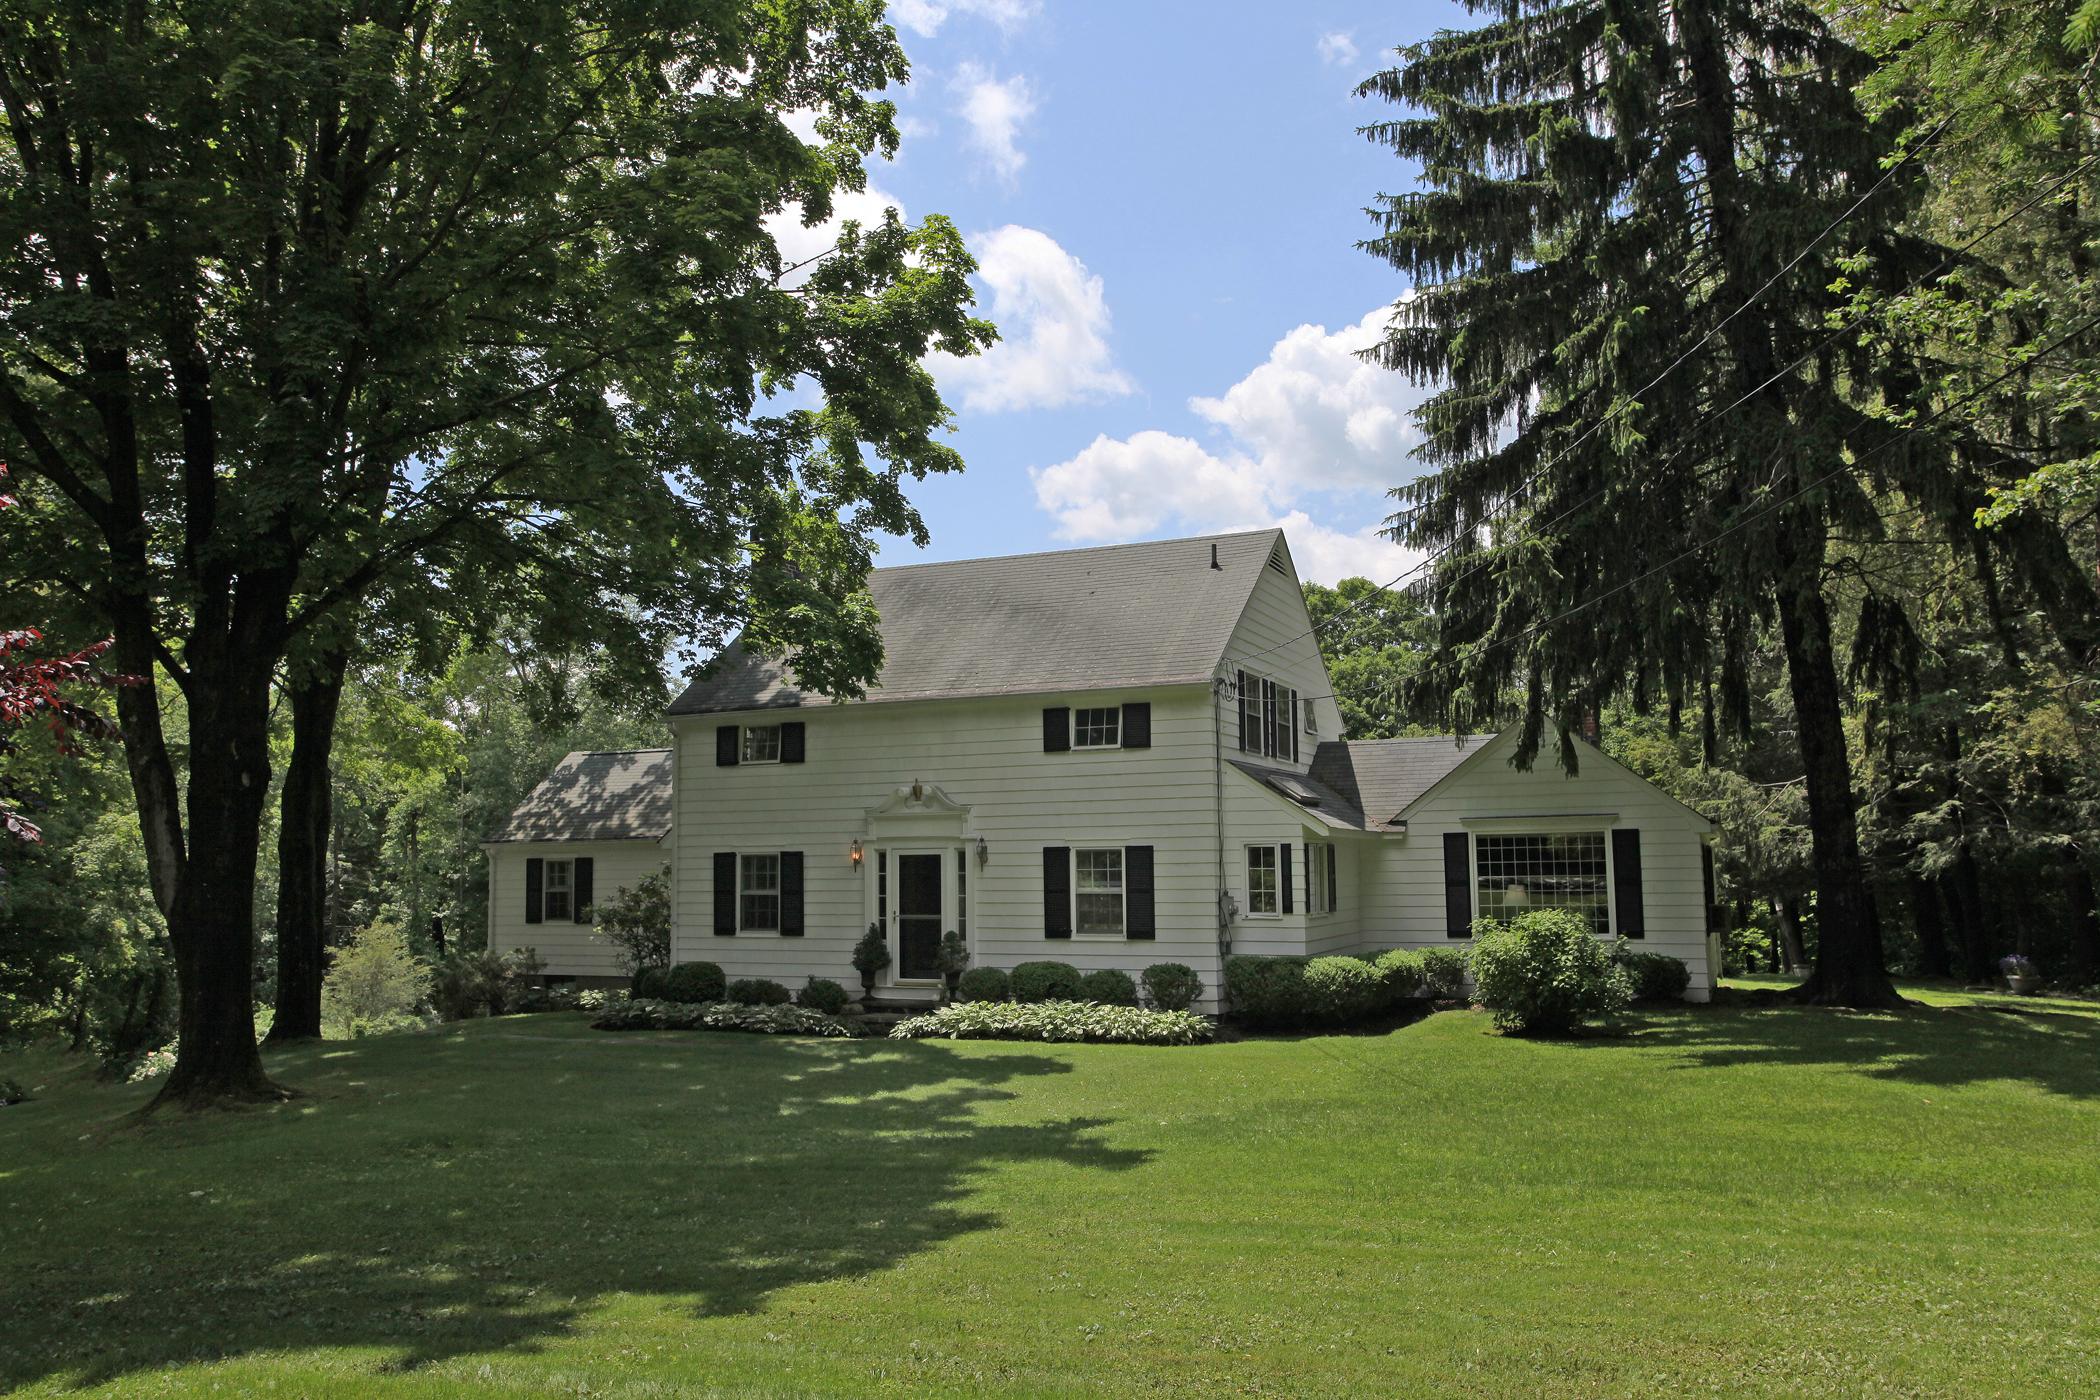 Casa Unifamiliar por un Venta en Charming Plum Hill Colonial 21 Plumb Hill Rd Washington, Connecticut 06793 Estados Unidos